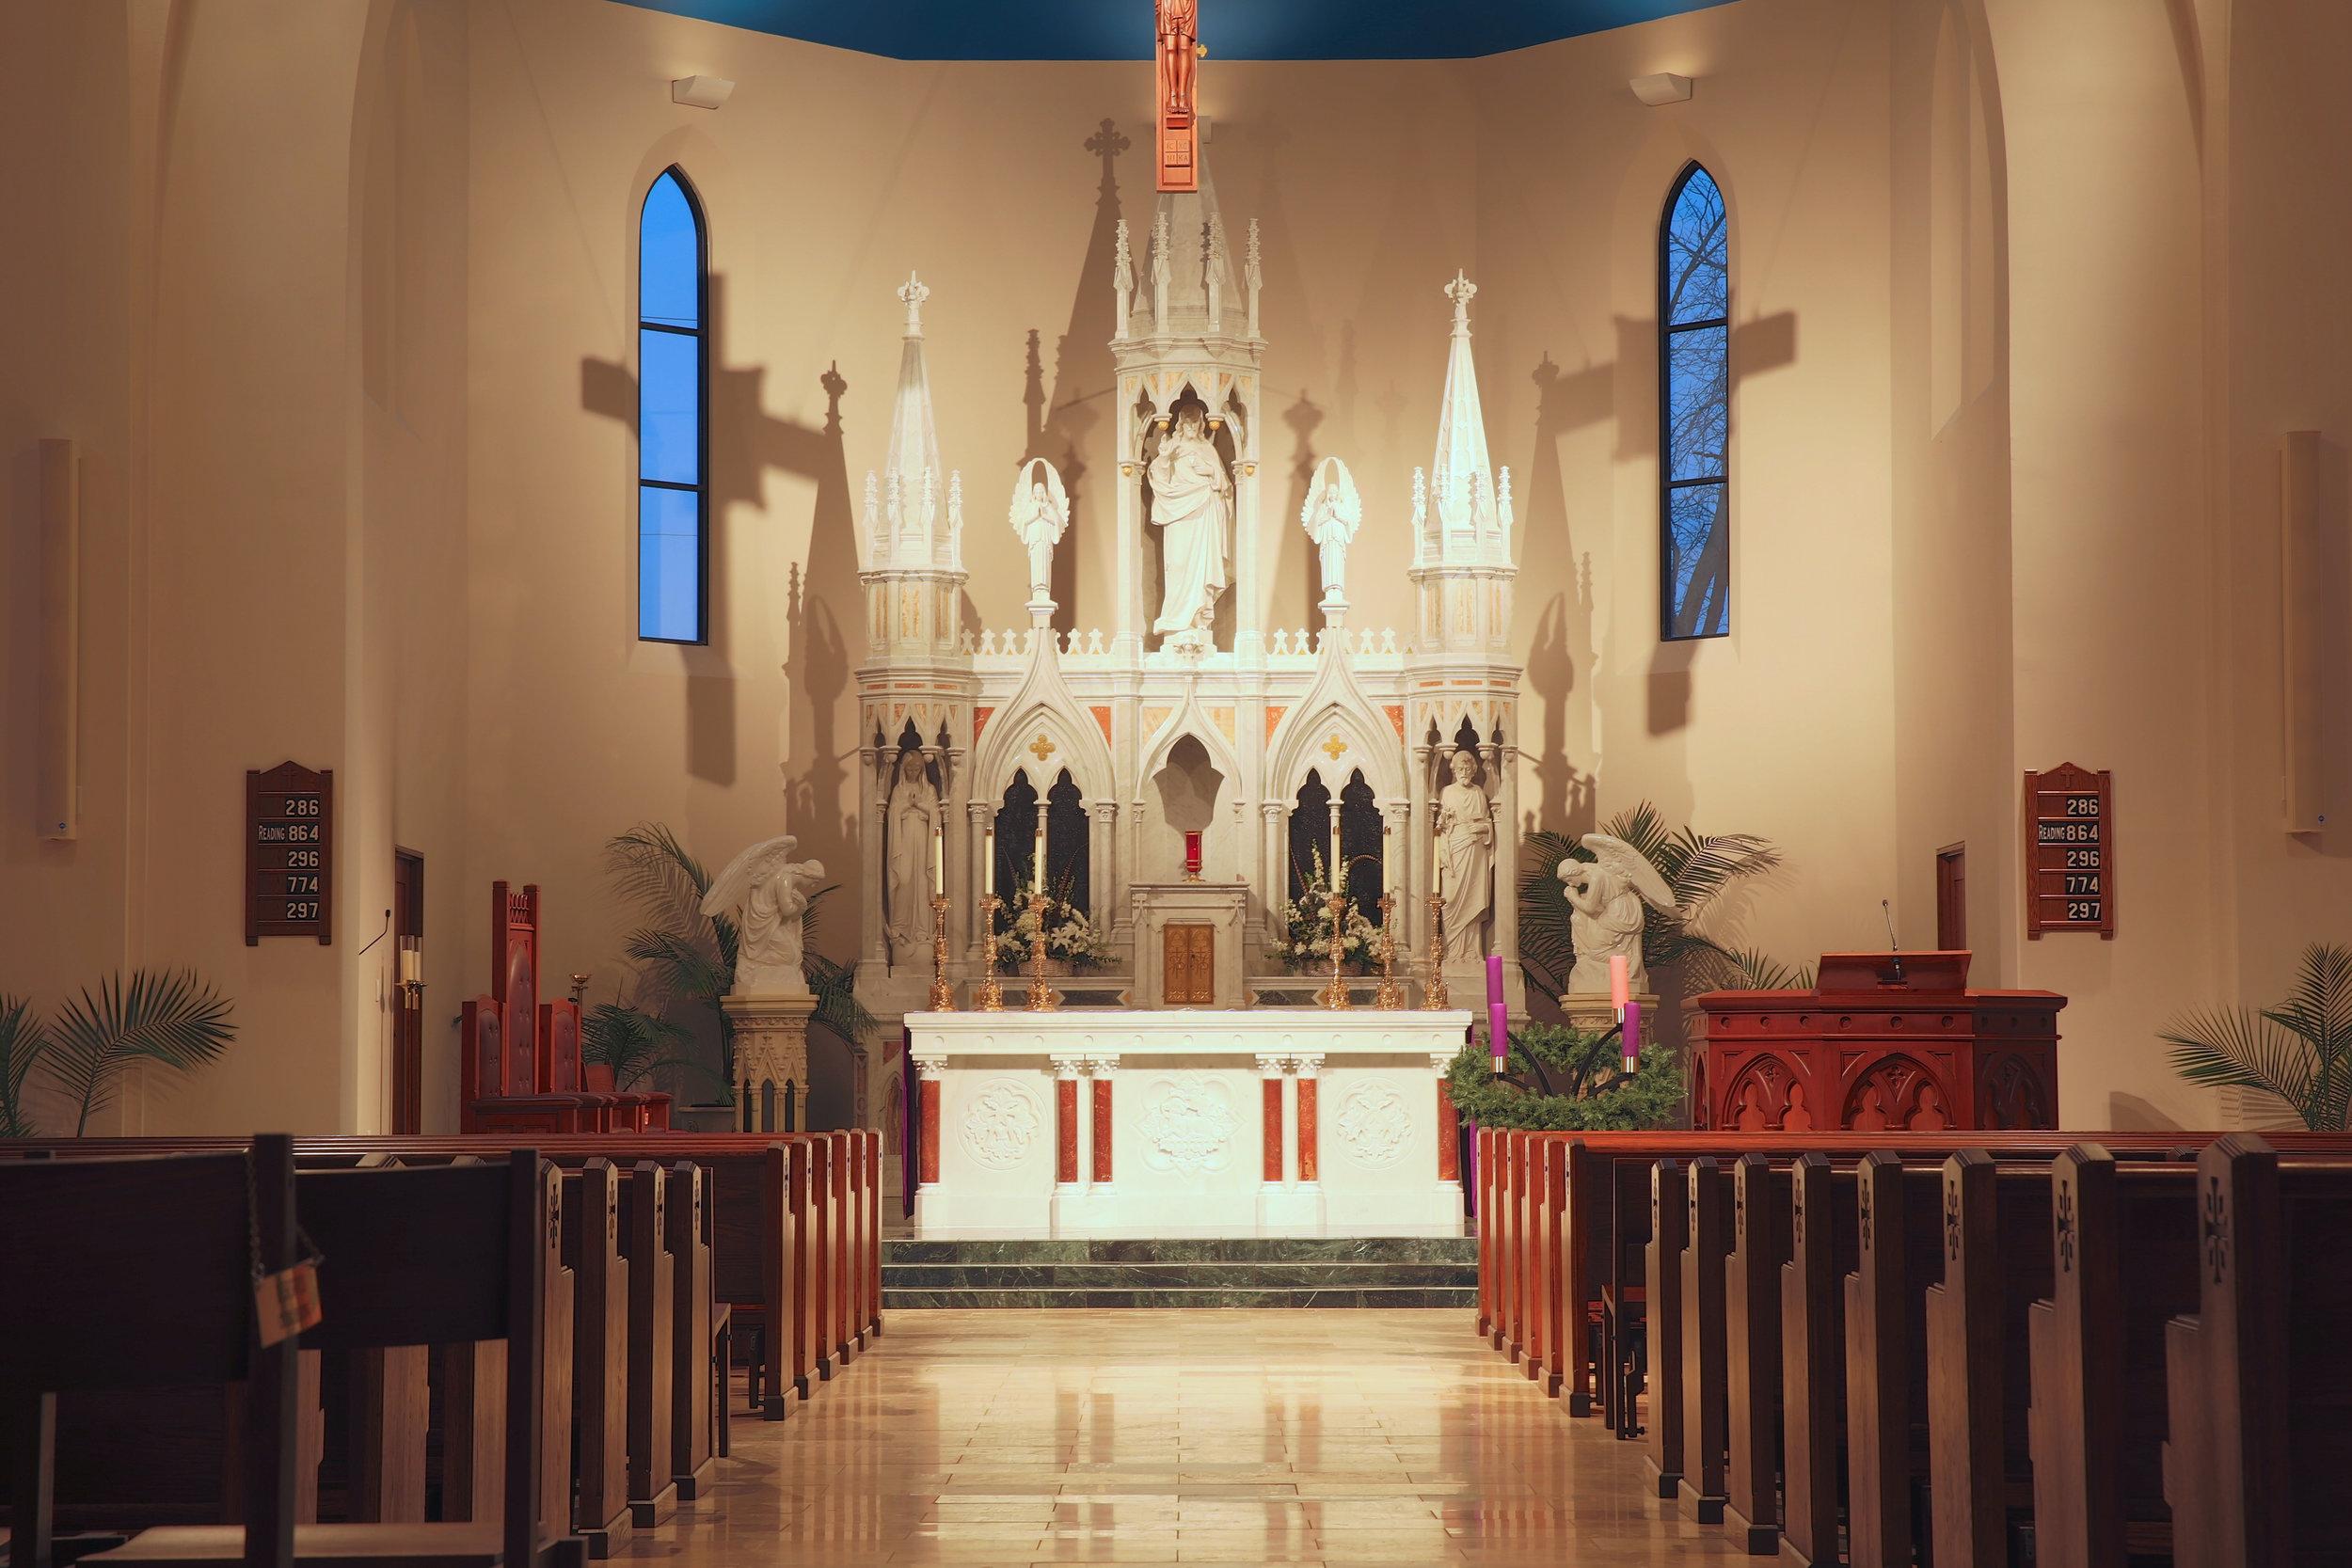 3-D interactive walk through of St. Kateri in Ridgway, Illinois